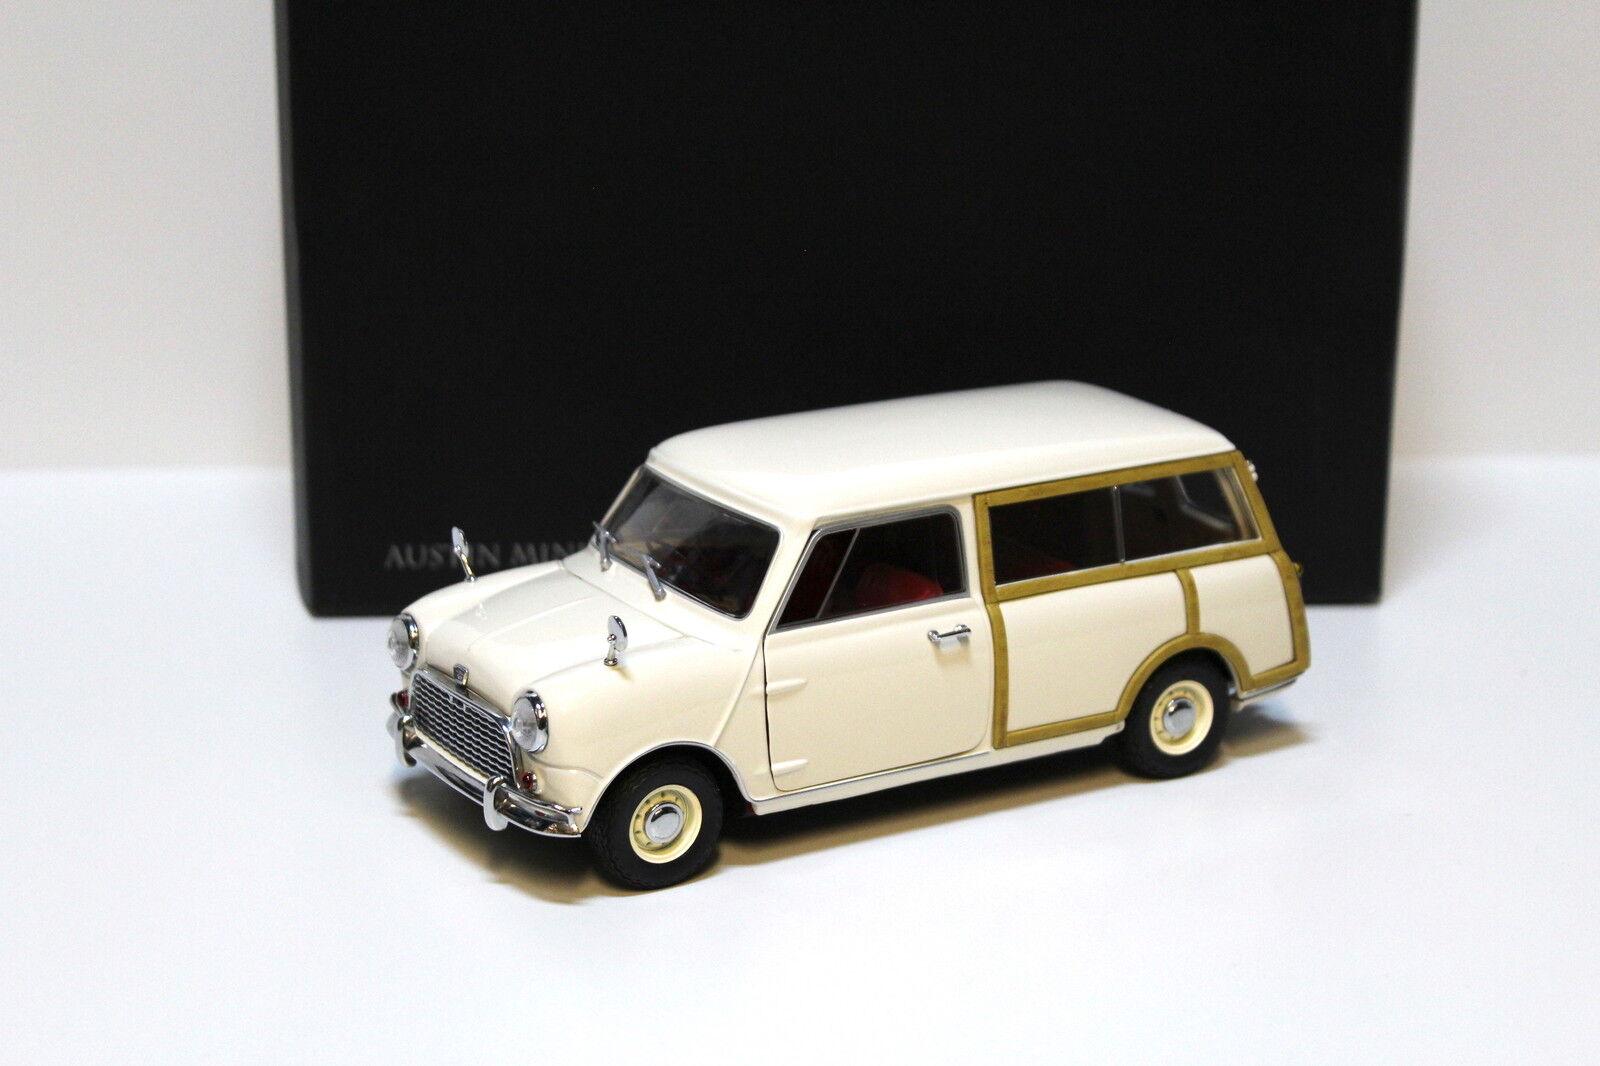 ahorra hasta un 50% 1 18 Kyosho Austin Mini Countryman Countryman Countryman blanco New en Premium-modelCoches  a la venta